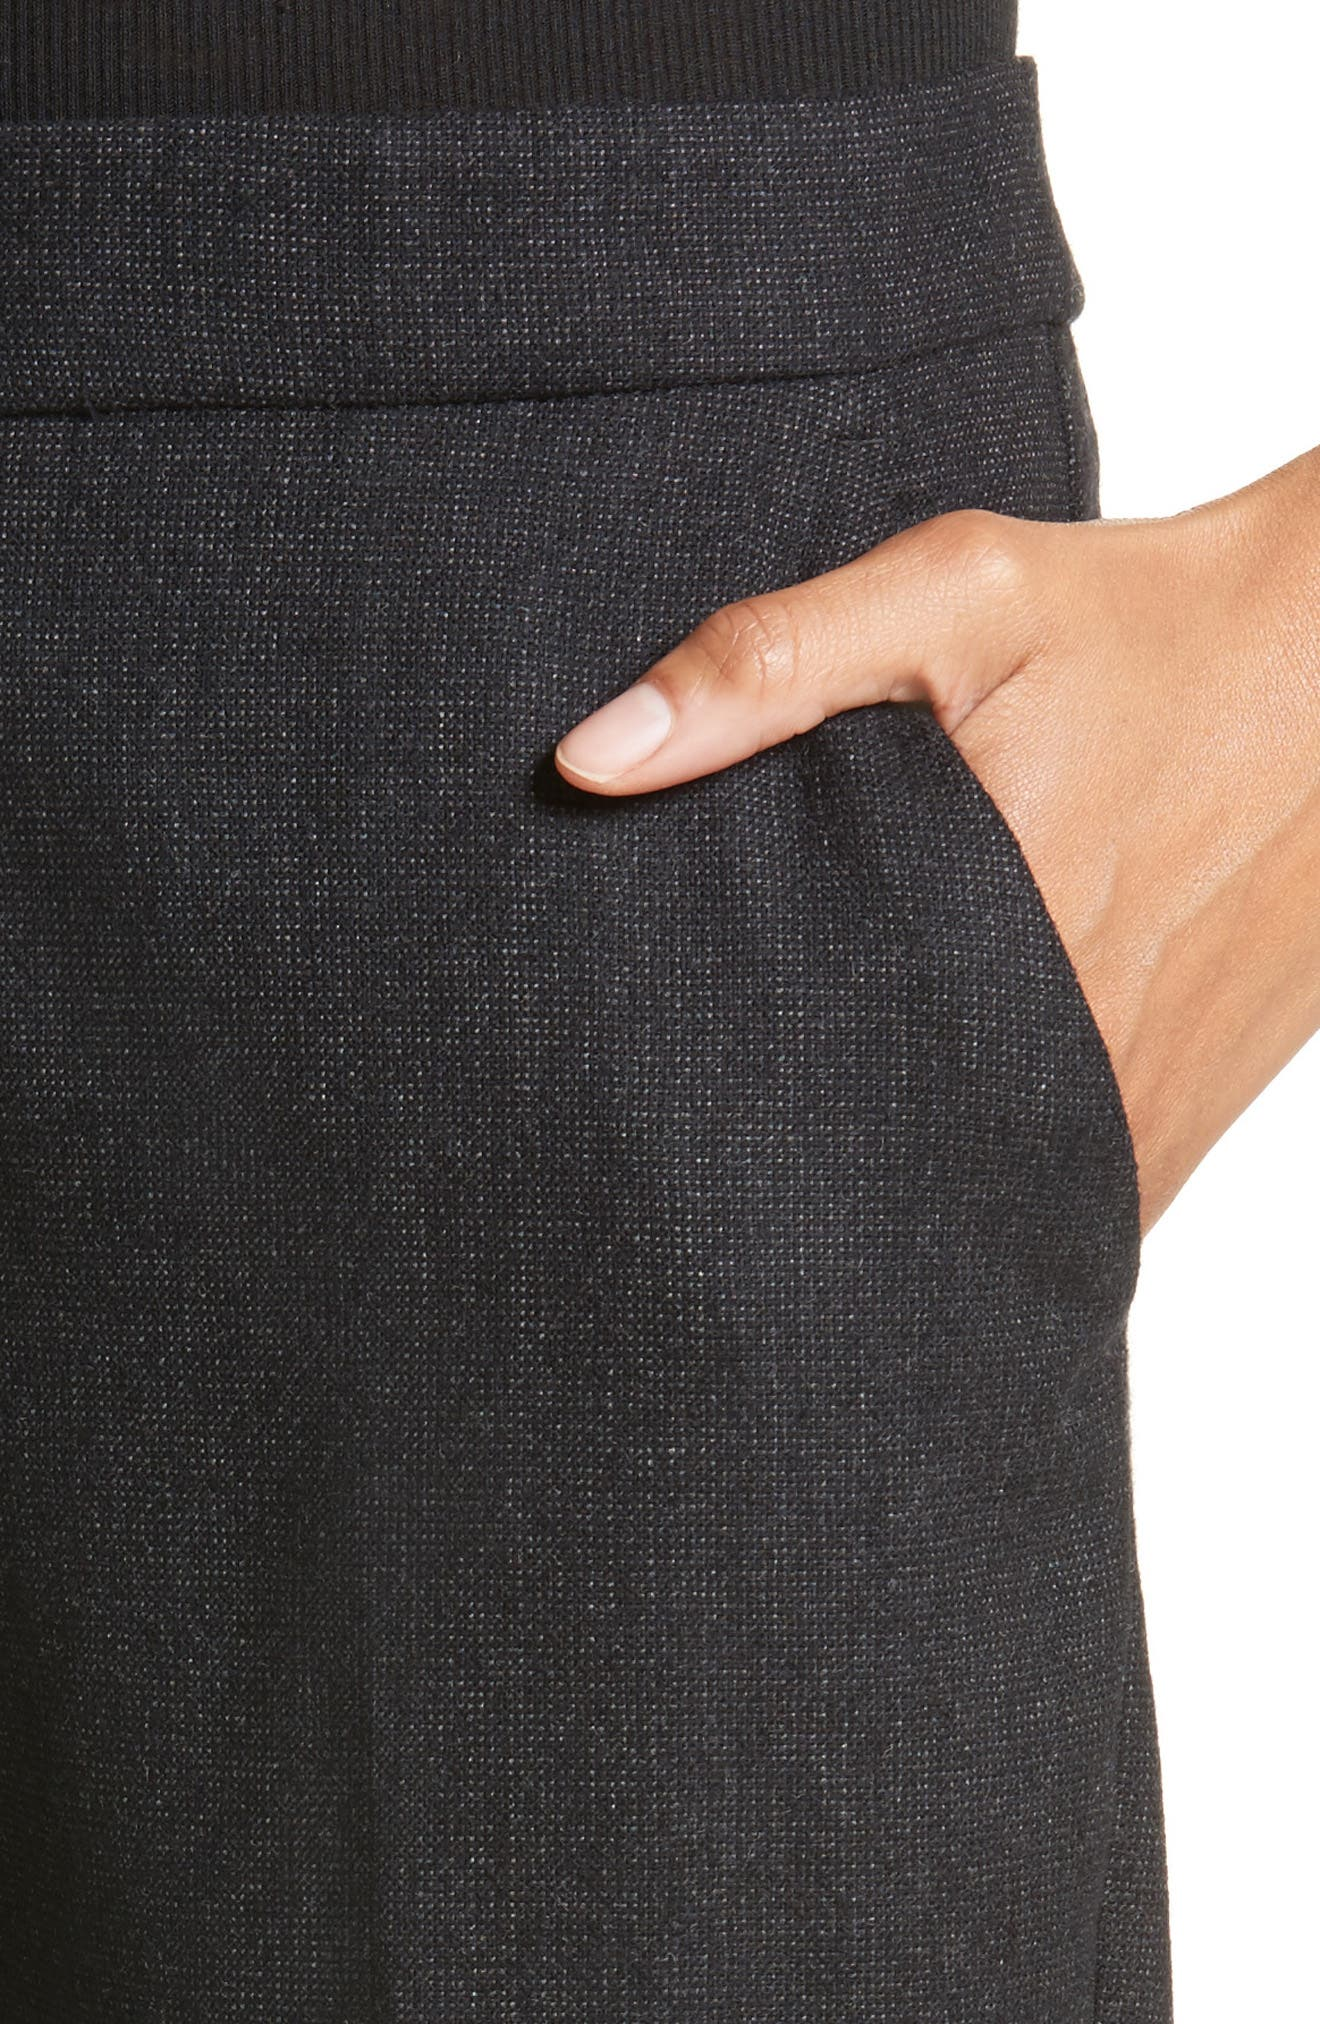 Armani Jeans Stretch Wool Slim Pants,                             Alternate thumbnail 4, color,                             001